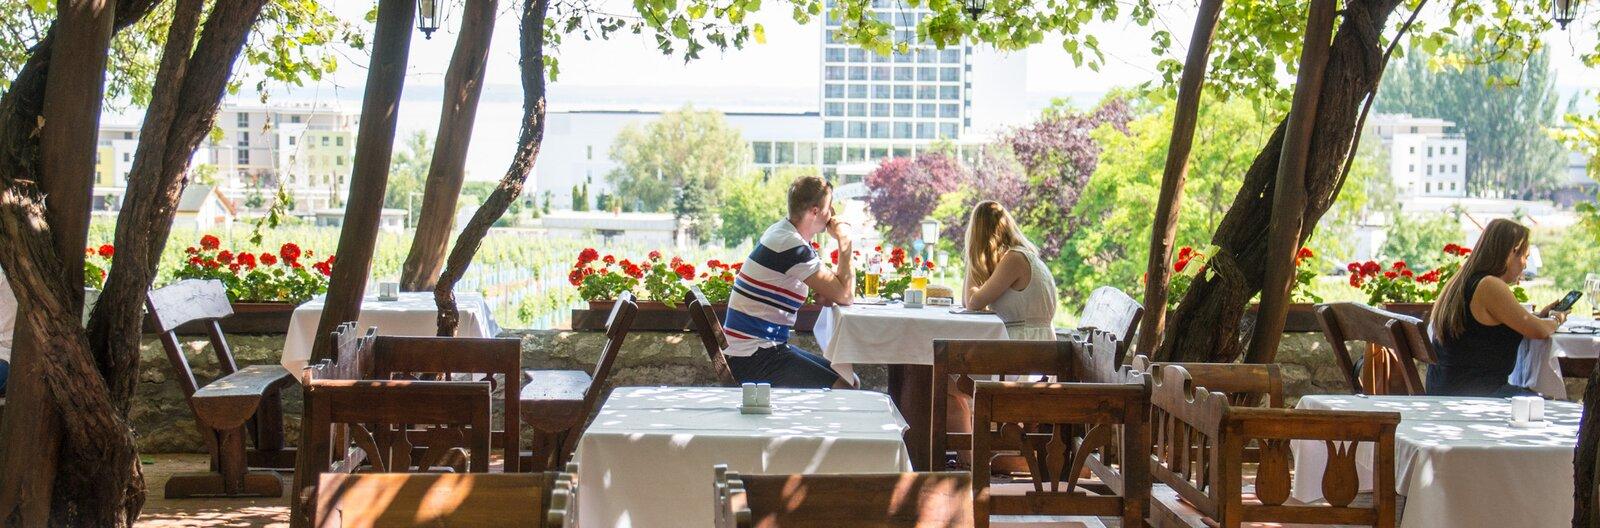 6 best wining and dining options at Lake Balaton this summer